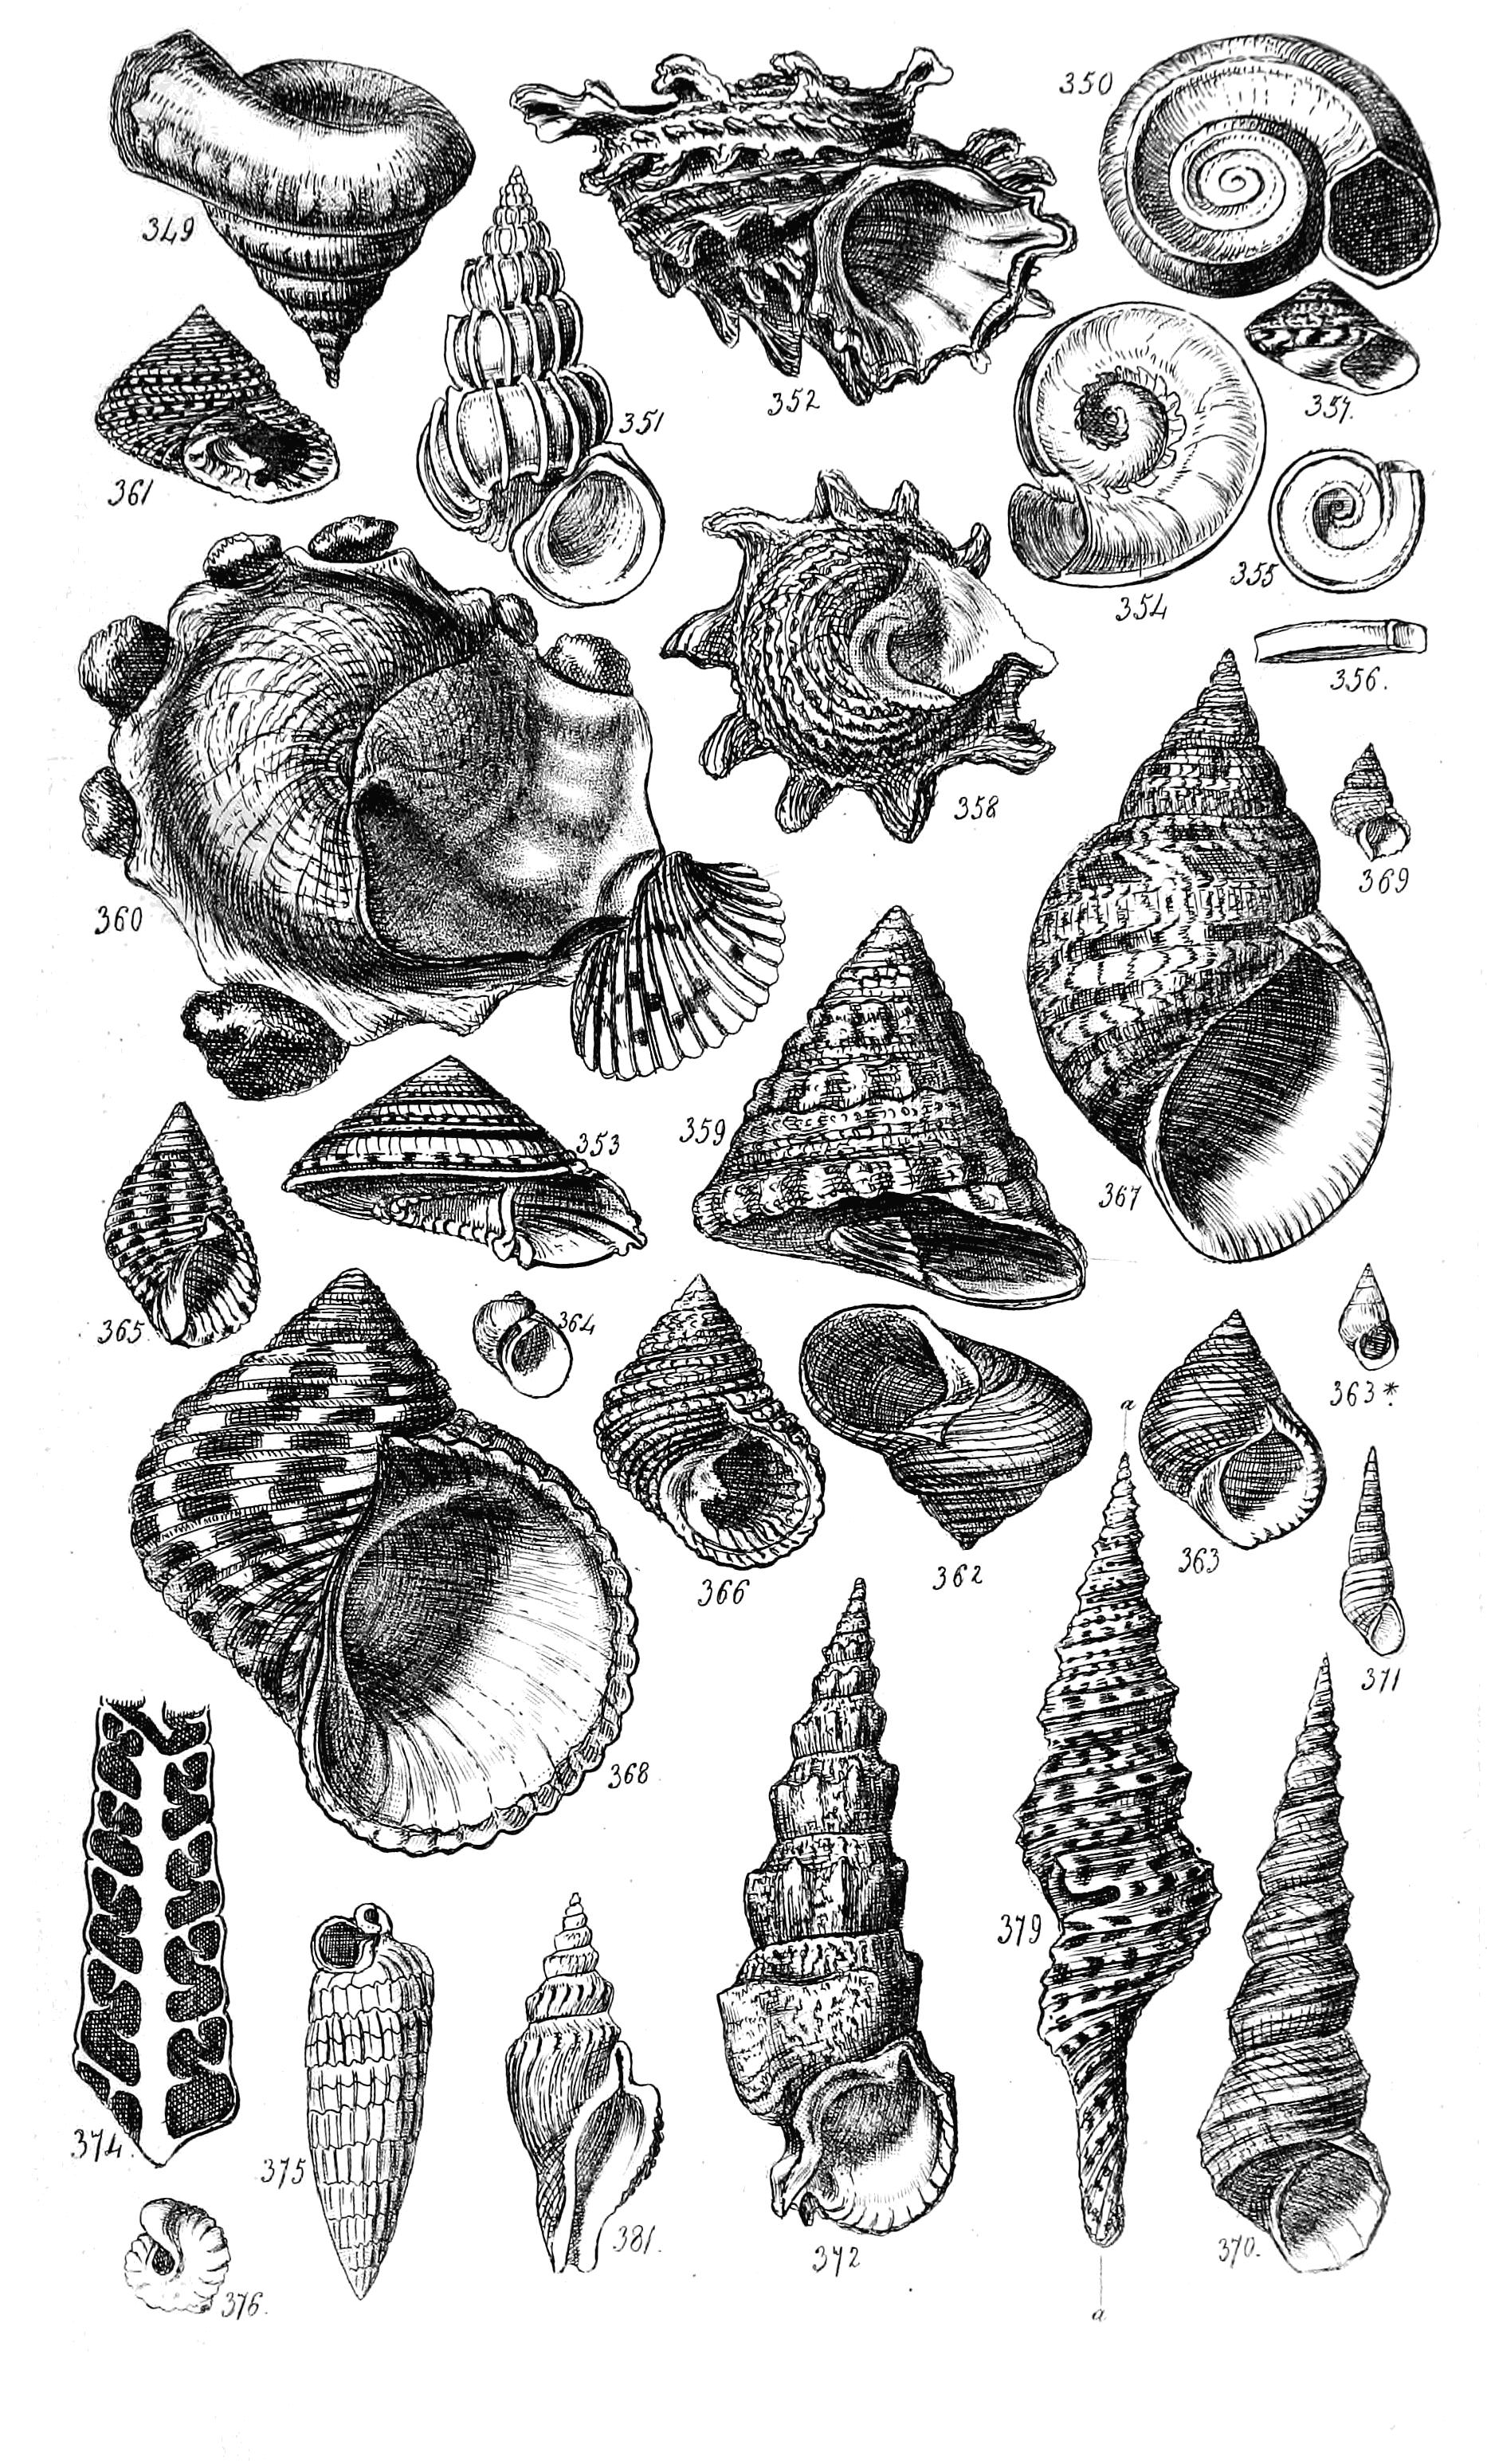 FileConchological Manual Plate 16